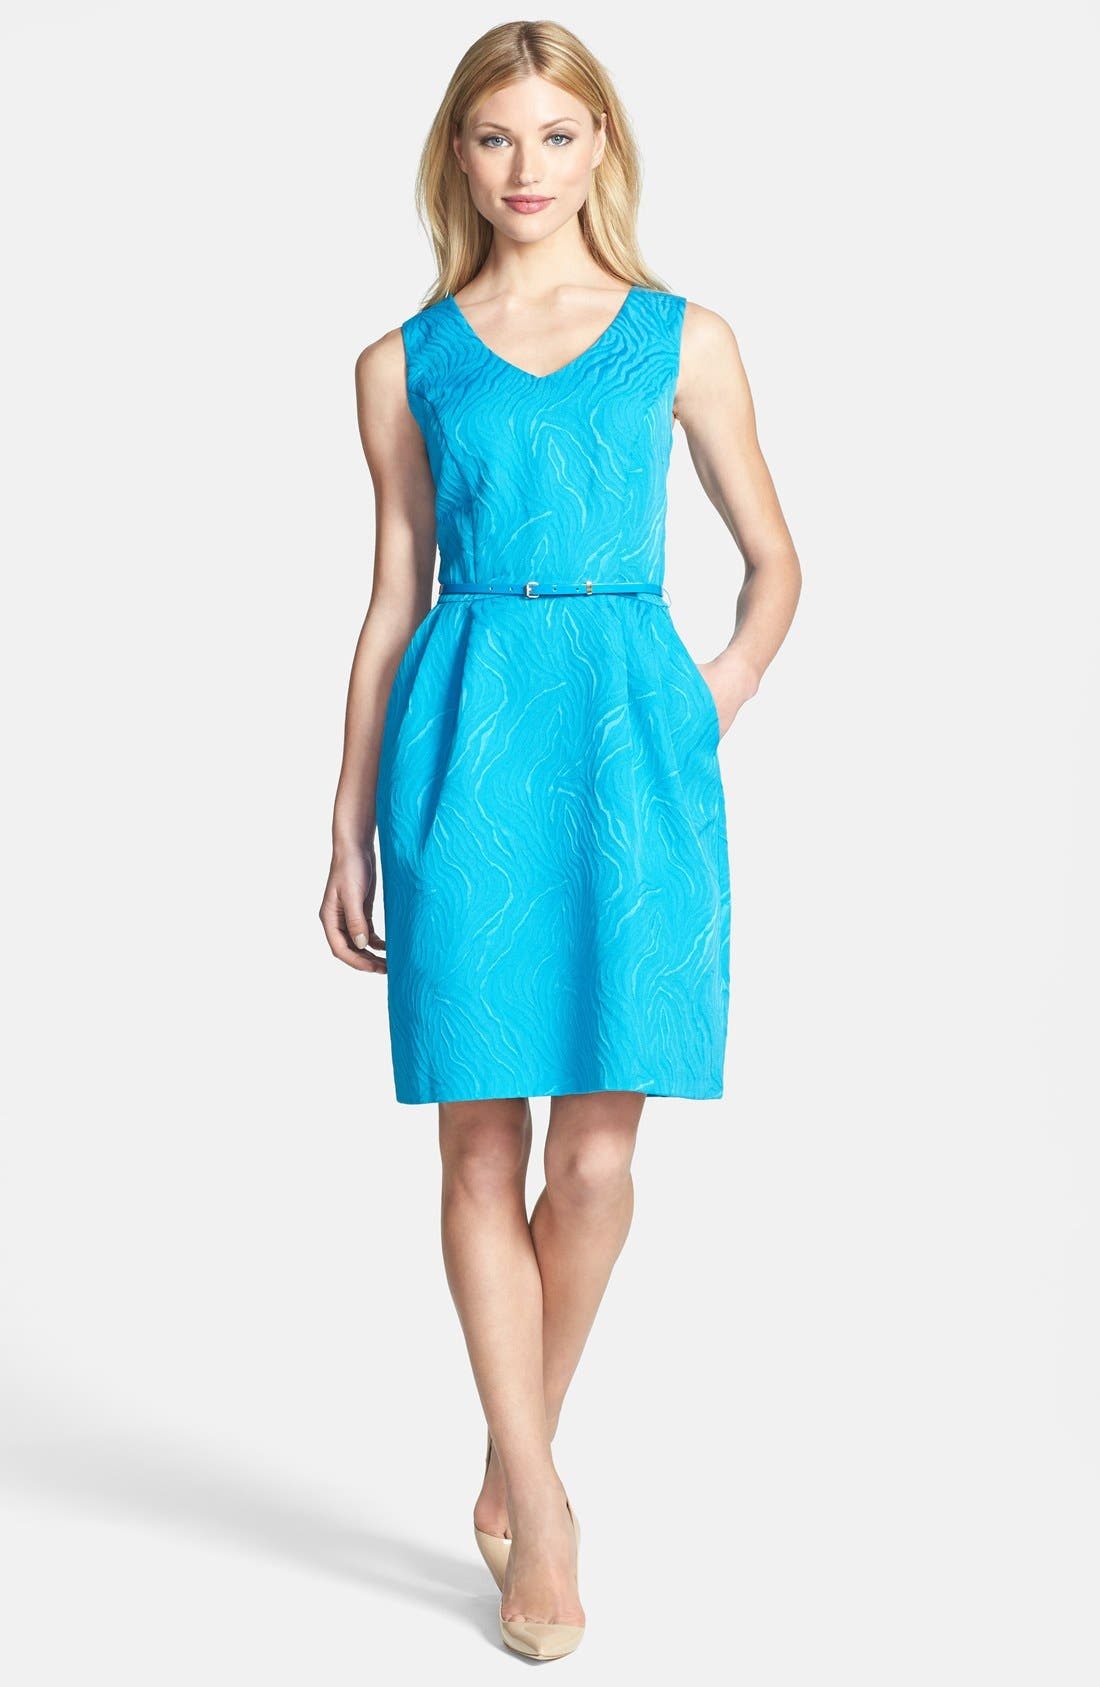 Alternate Image 1 Selected - Ellen Tracy Cutout Back Jacquard Fit & Flare Dress